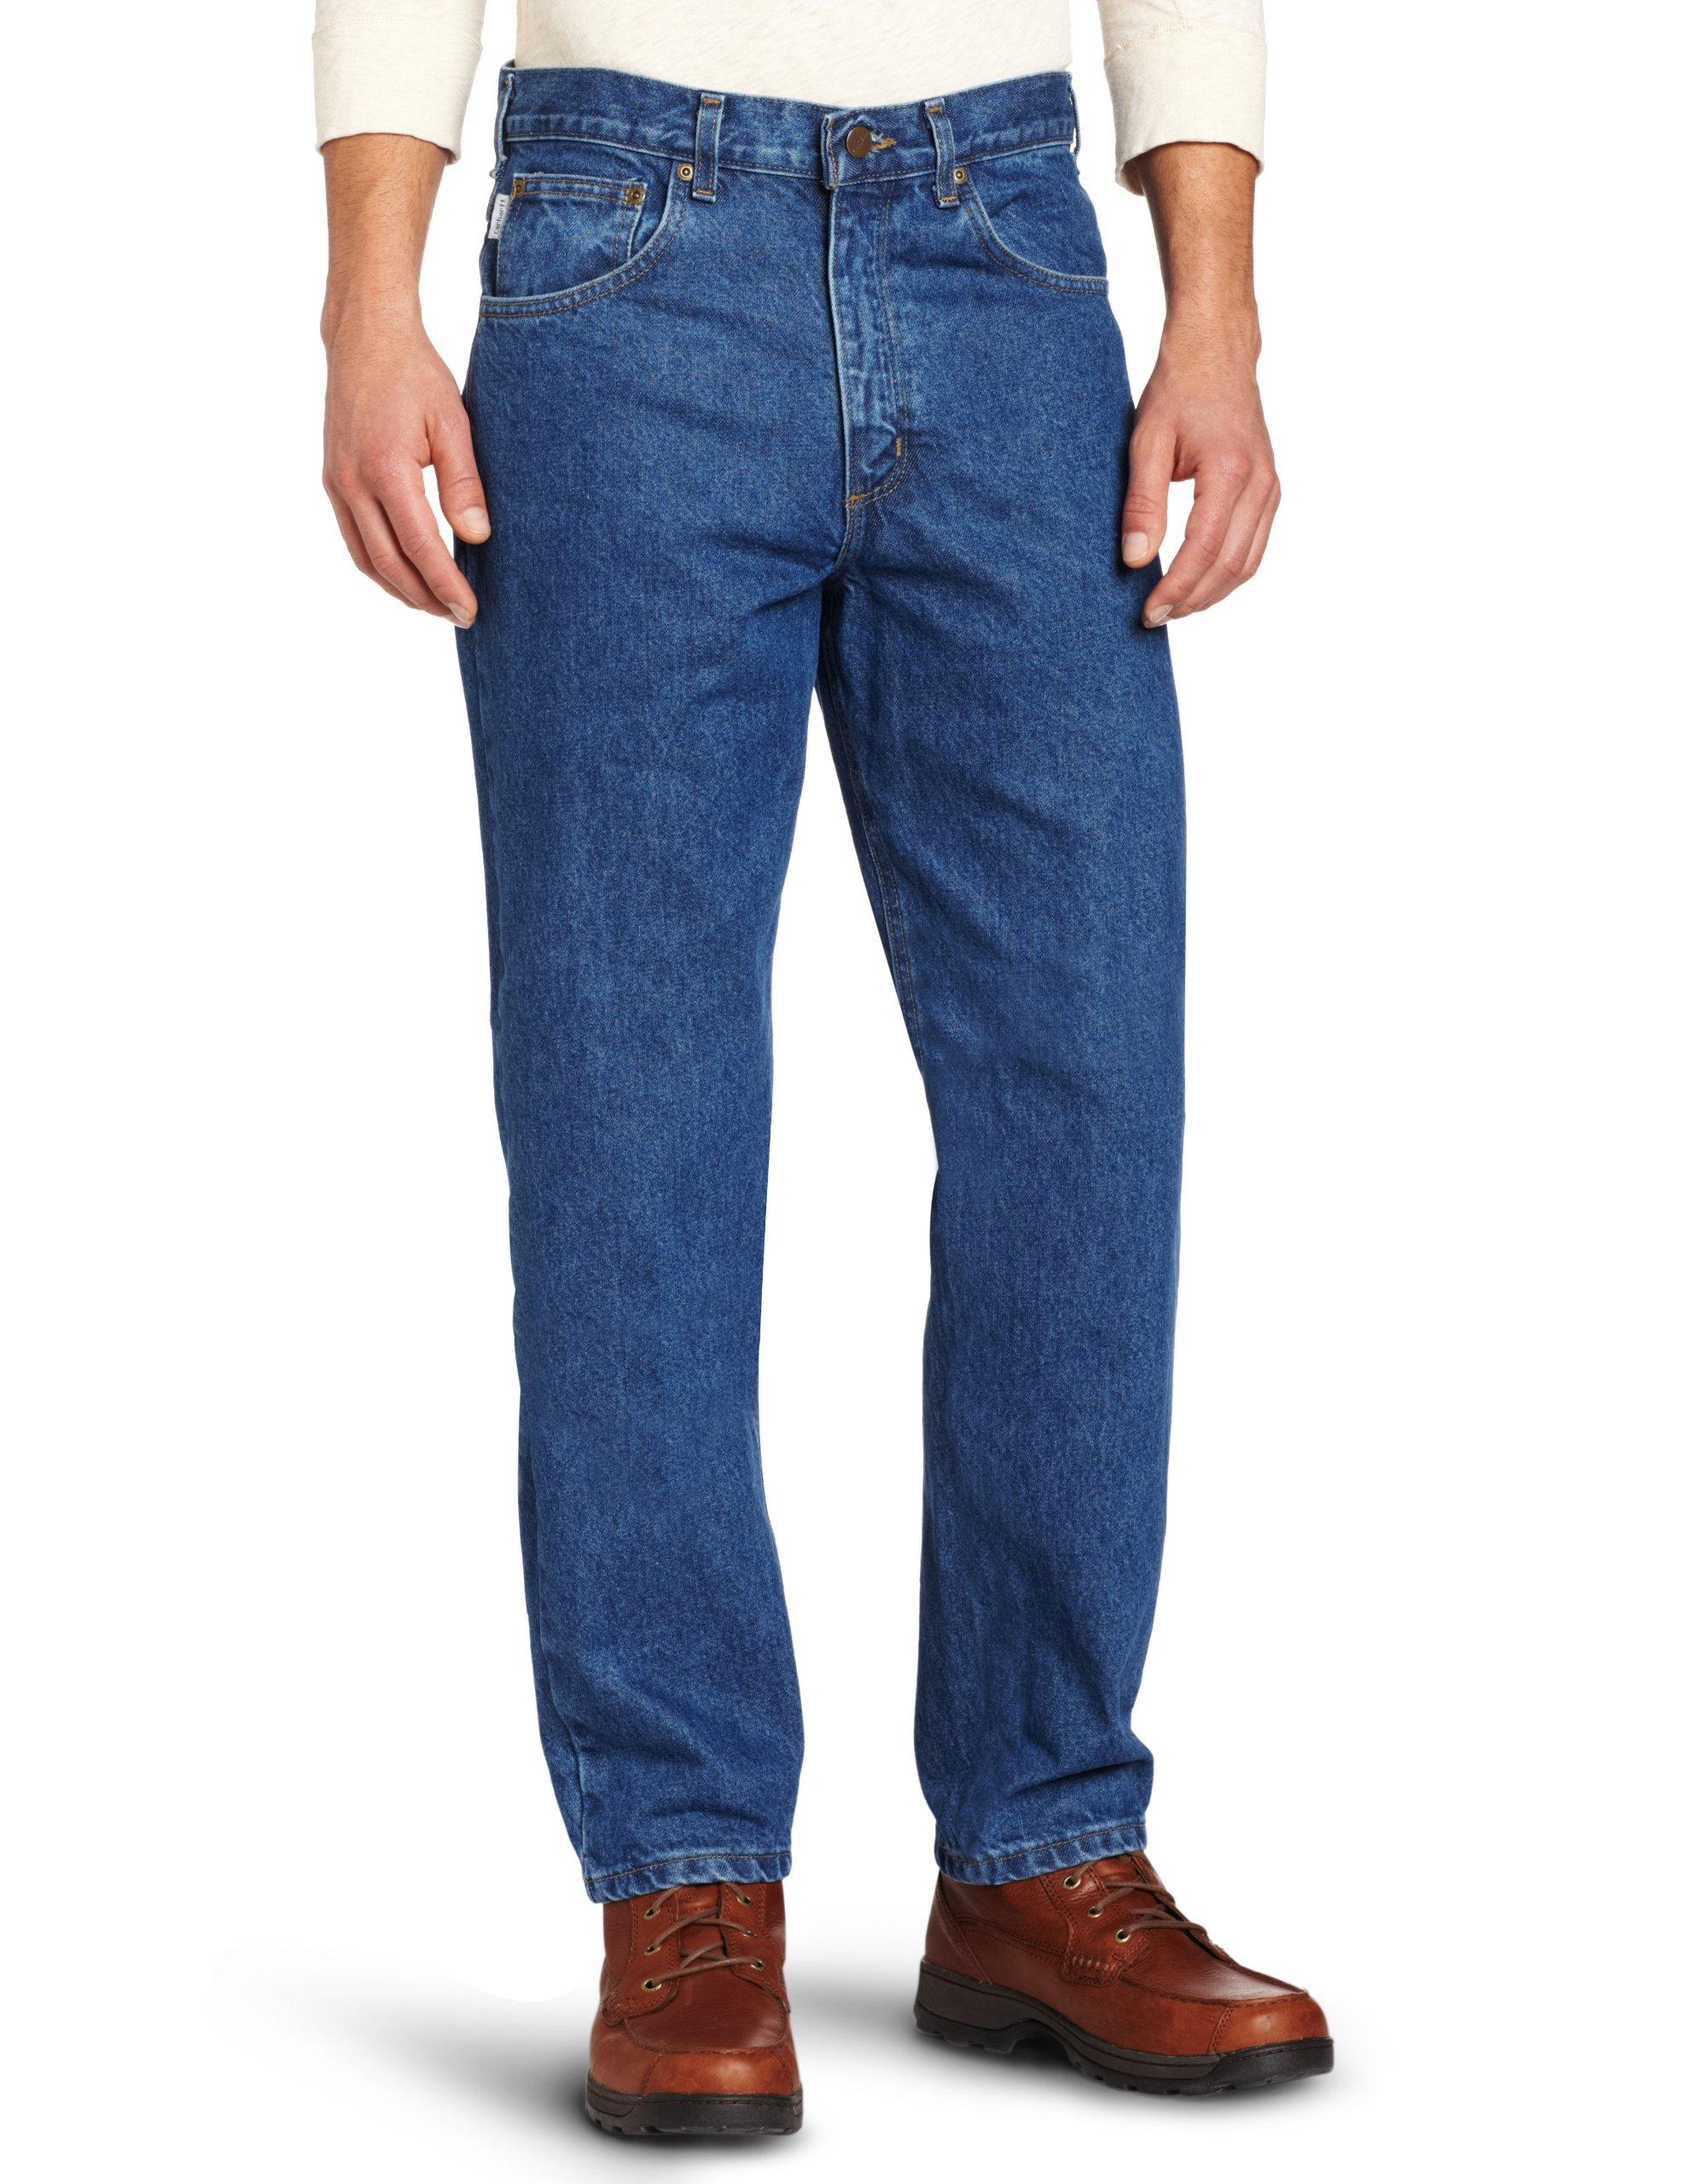 Carhartt Men's Relaxed Fit Five Pocket Tapered Leg Jean B17,Darkstone,36 x 28